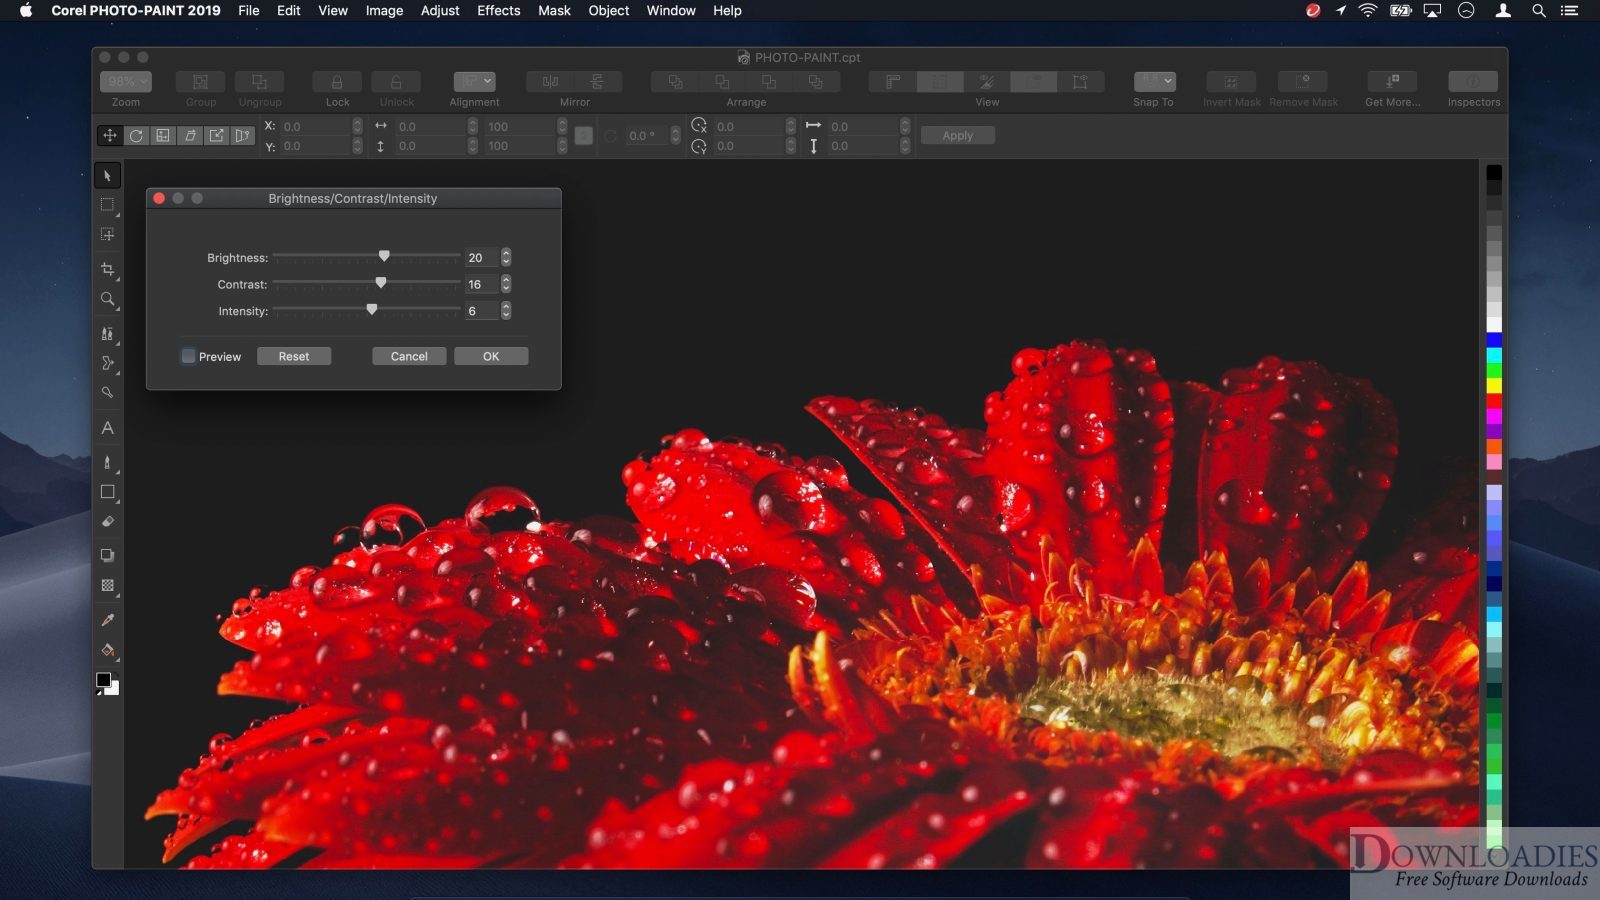 Corel Painter 2020 v20.0 for Mac download free